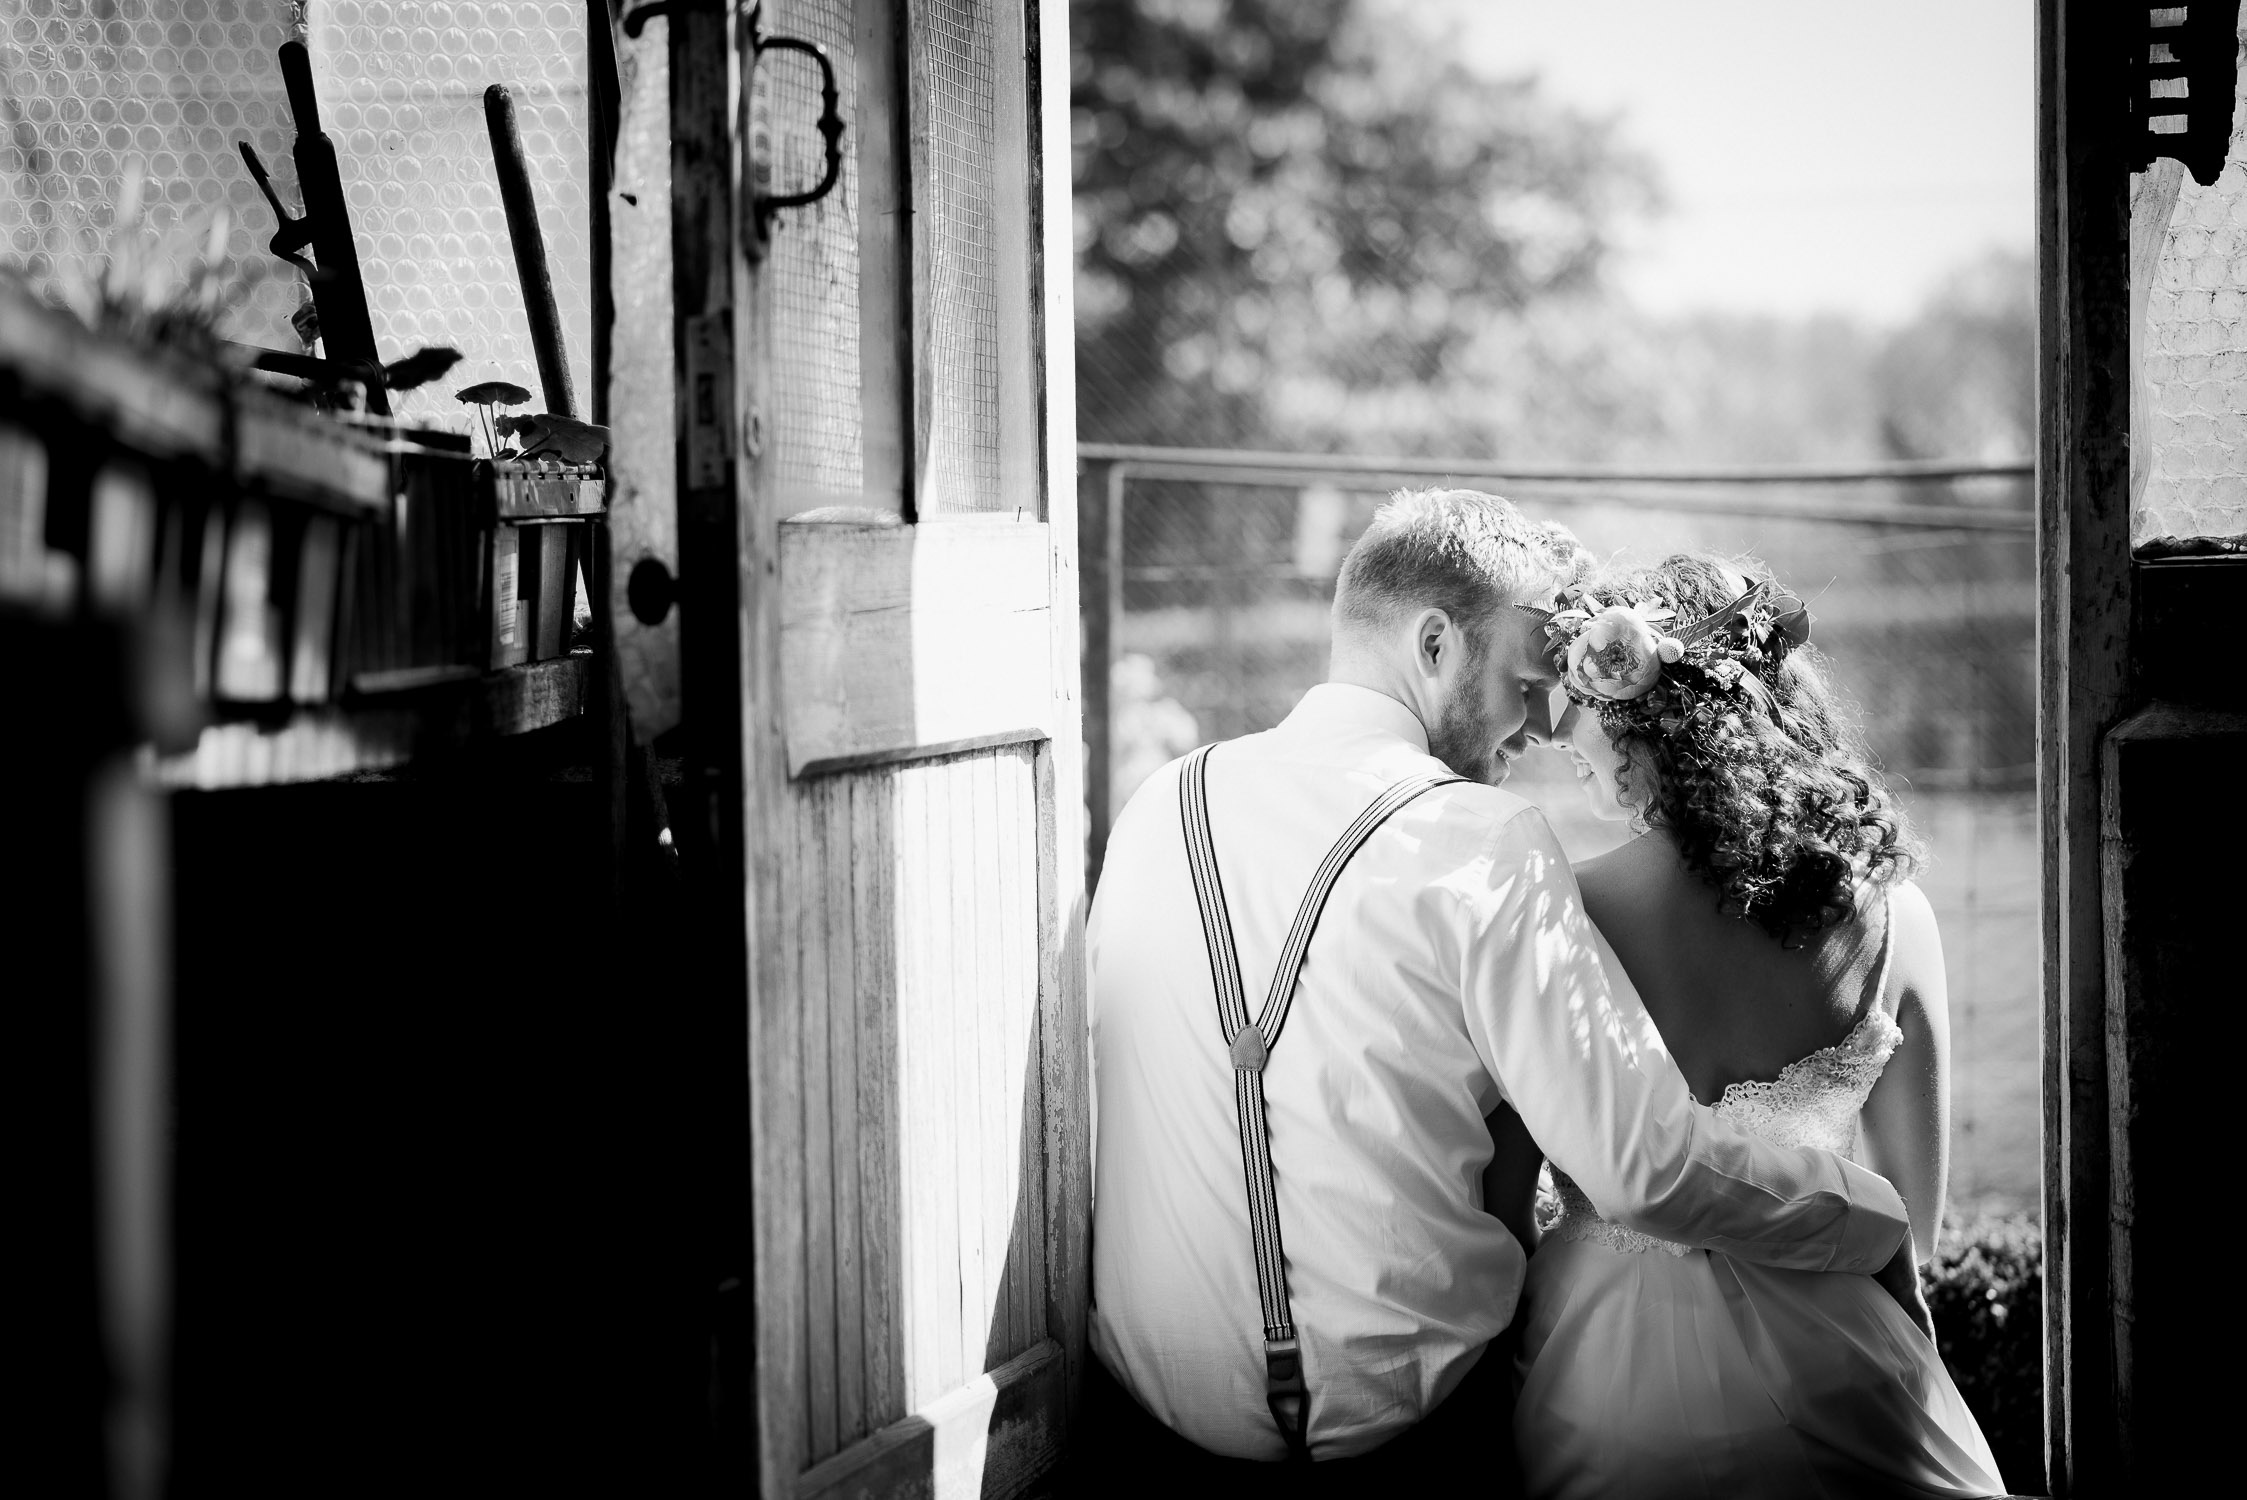 Liverpool wedding photography (34 of 42)